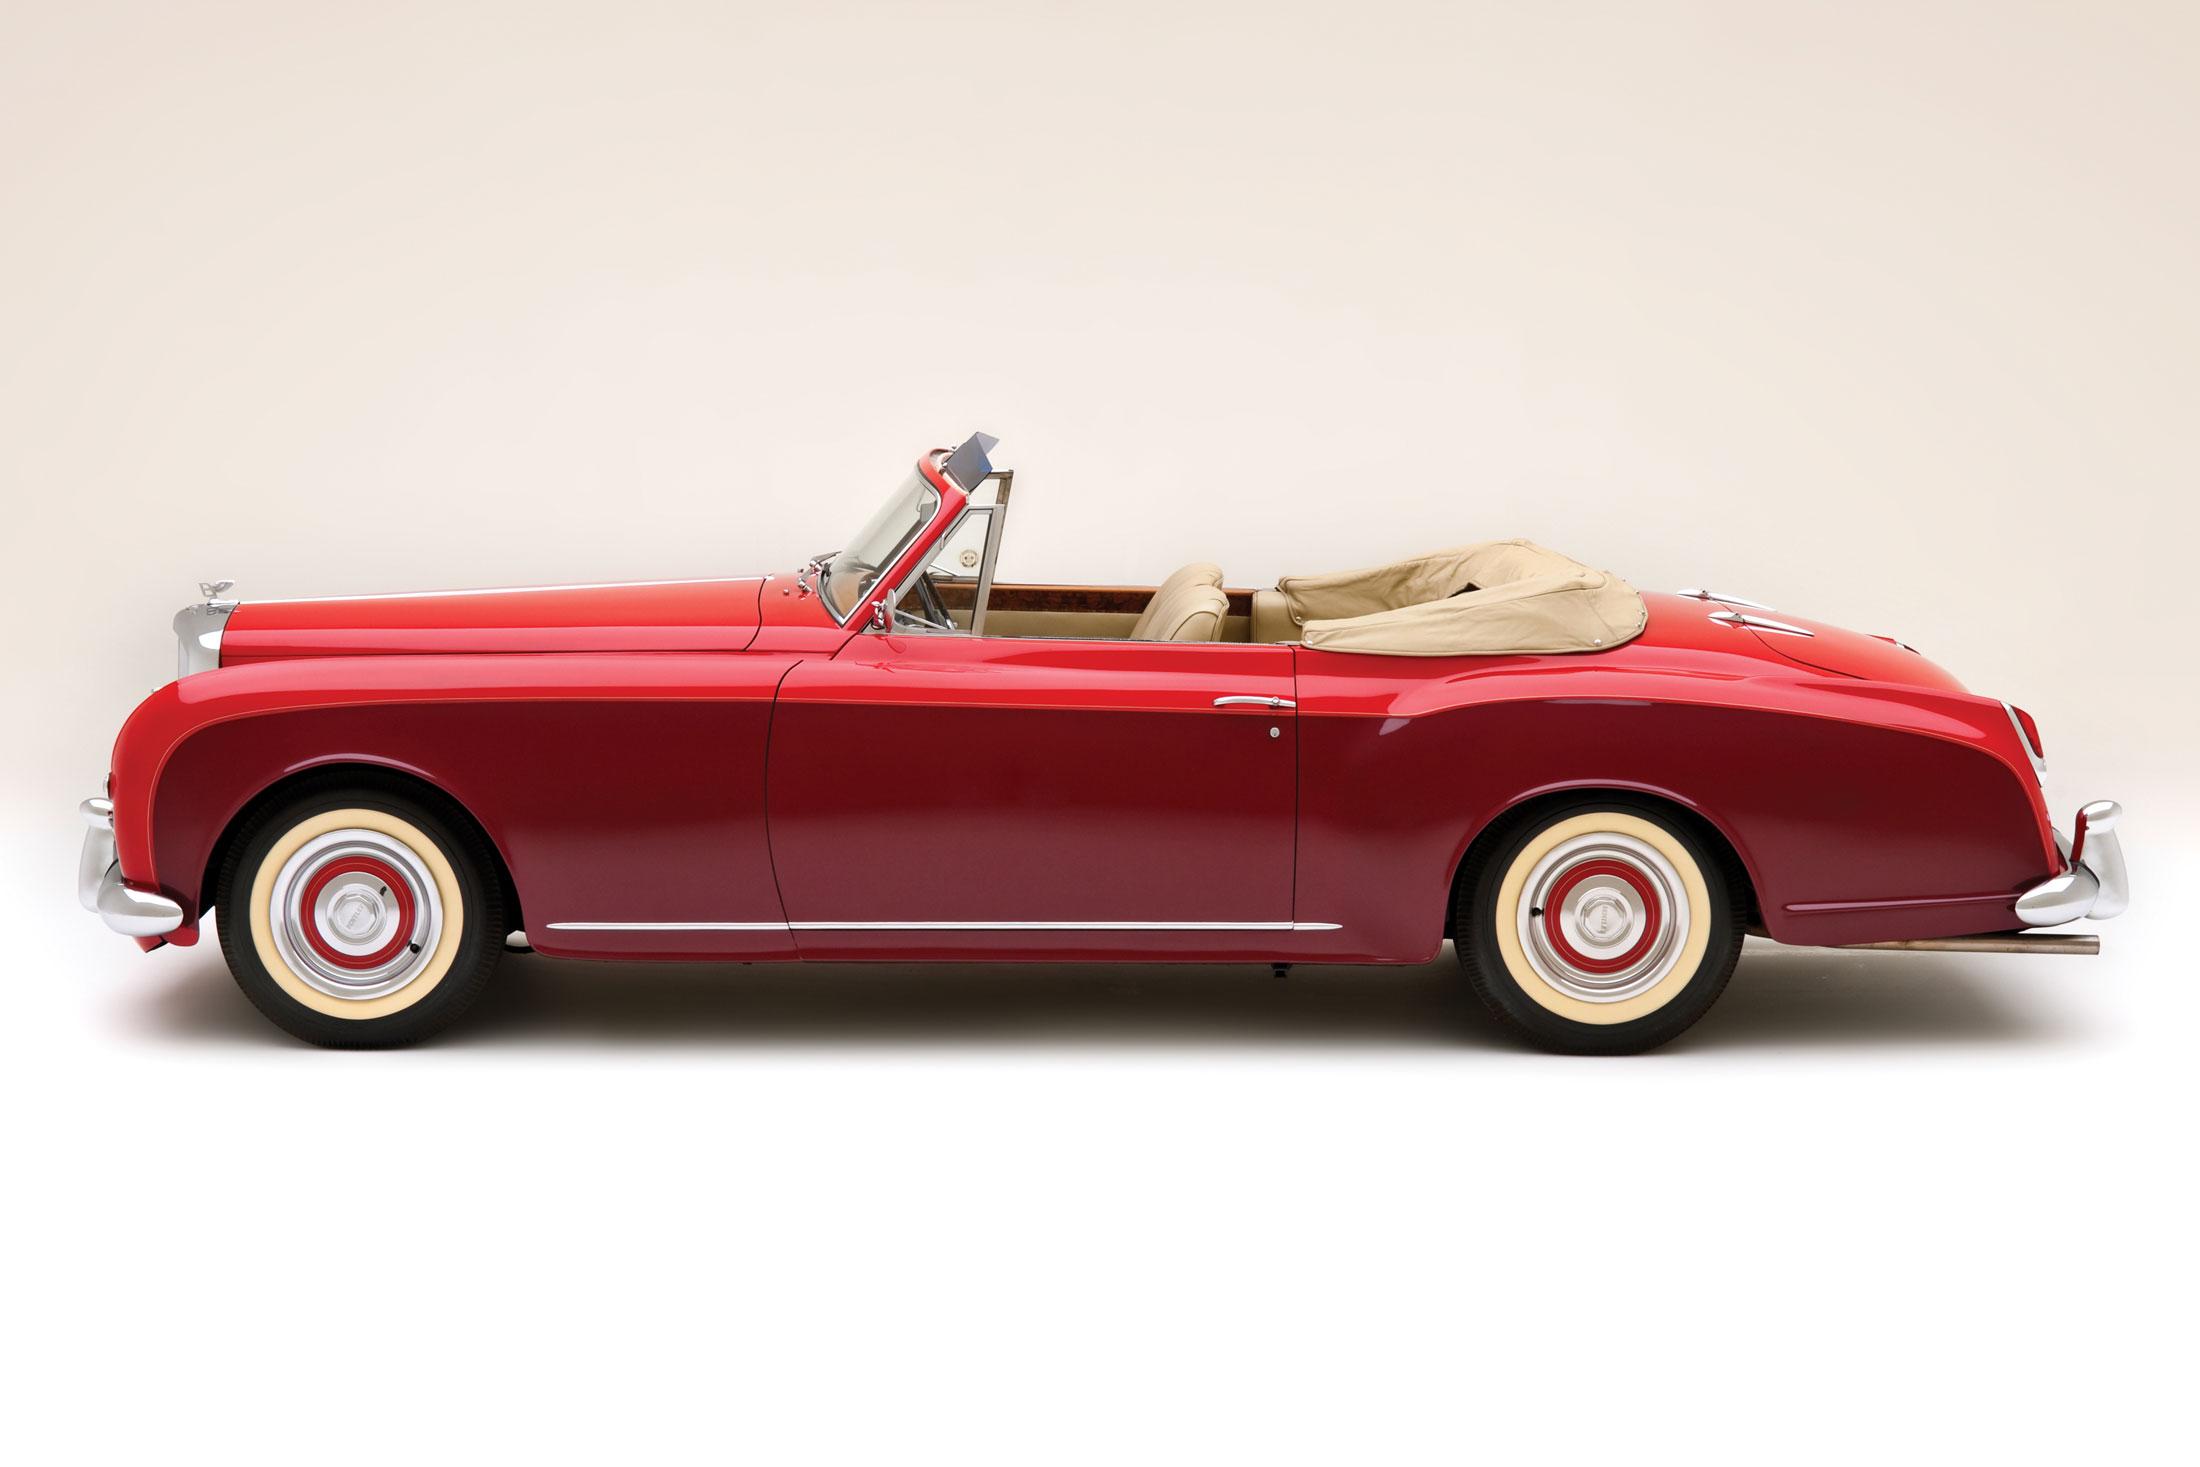 1956 Bentley S1 Continental Drophead Coupe | RM Sotheby's | Estimate $1.2 Million